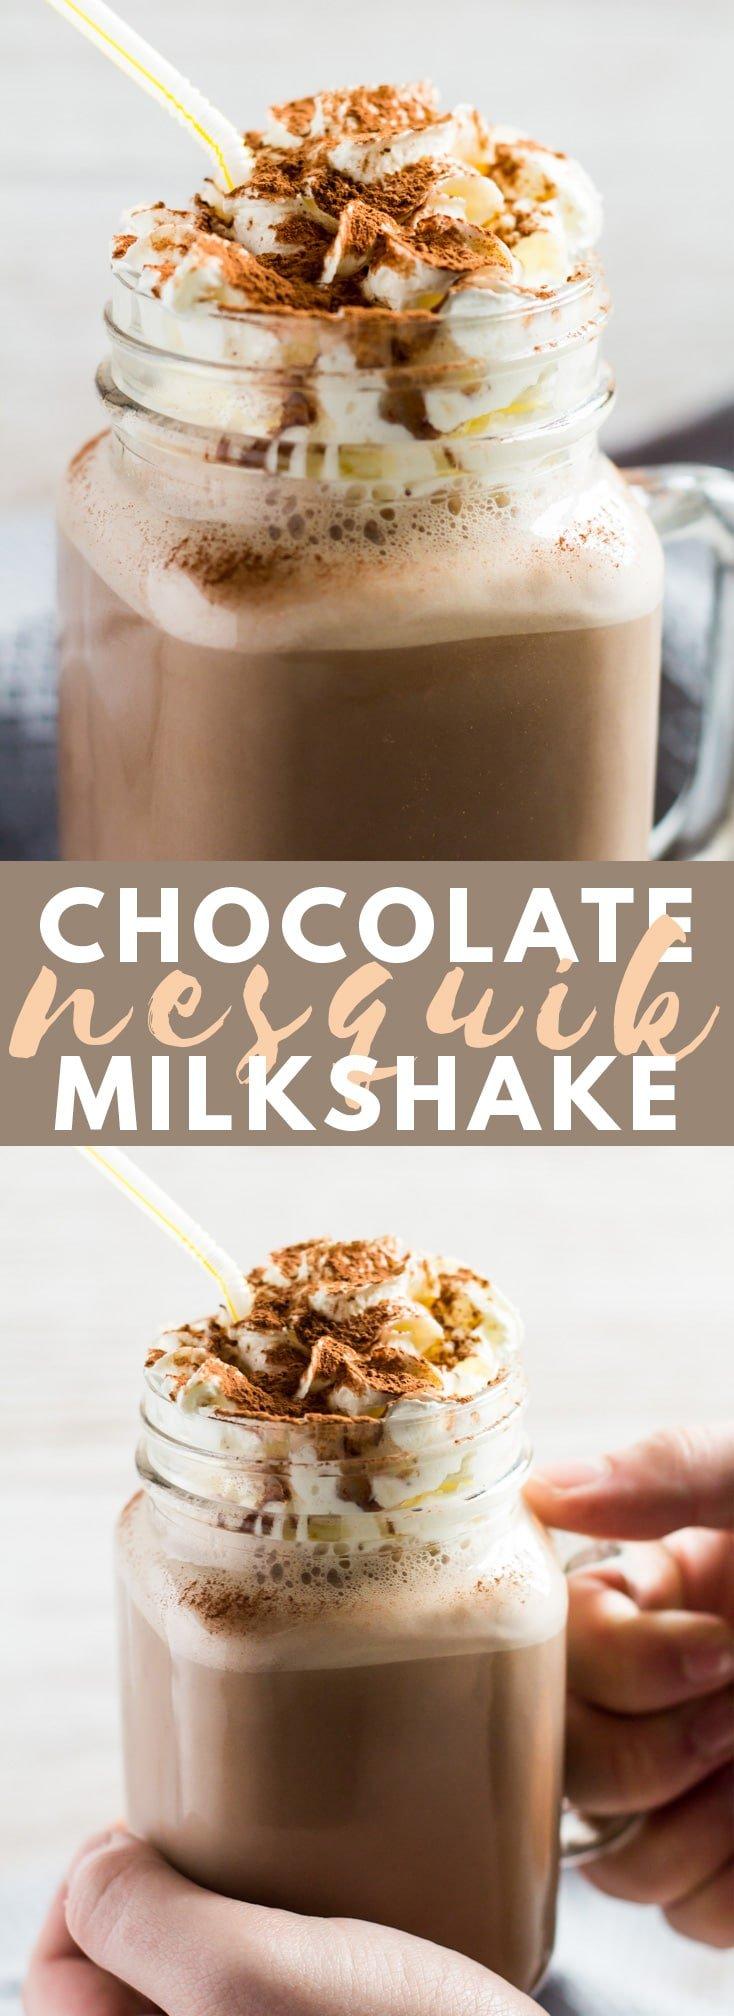 Chocolate Nesquik Milkshake - Deliciously thick and creamy milkshake made from vanilla ice cream and chocolate Nesquik powder. Top with whipped cream for a totally indulgent drink!